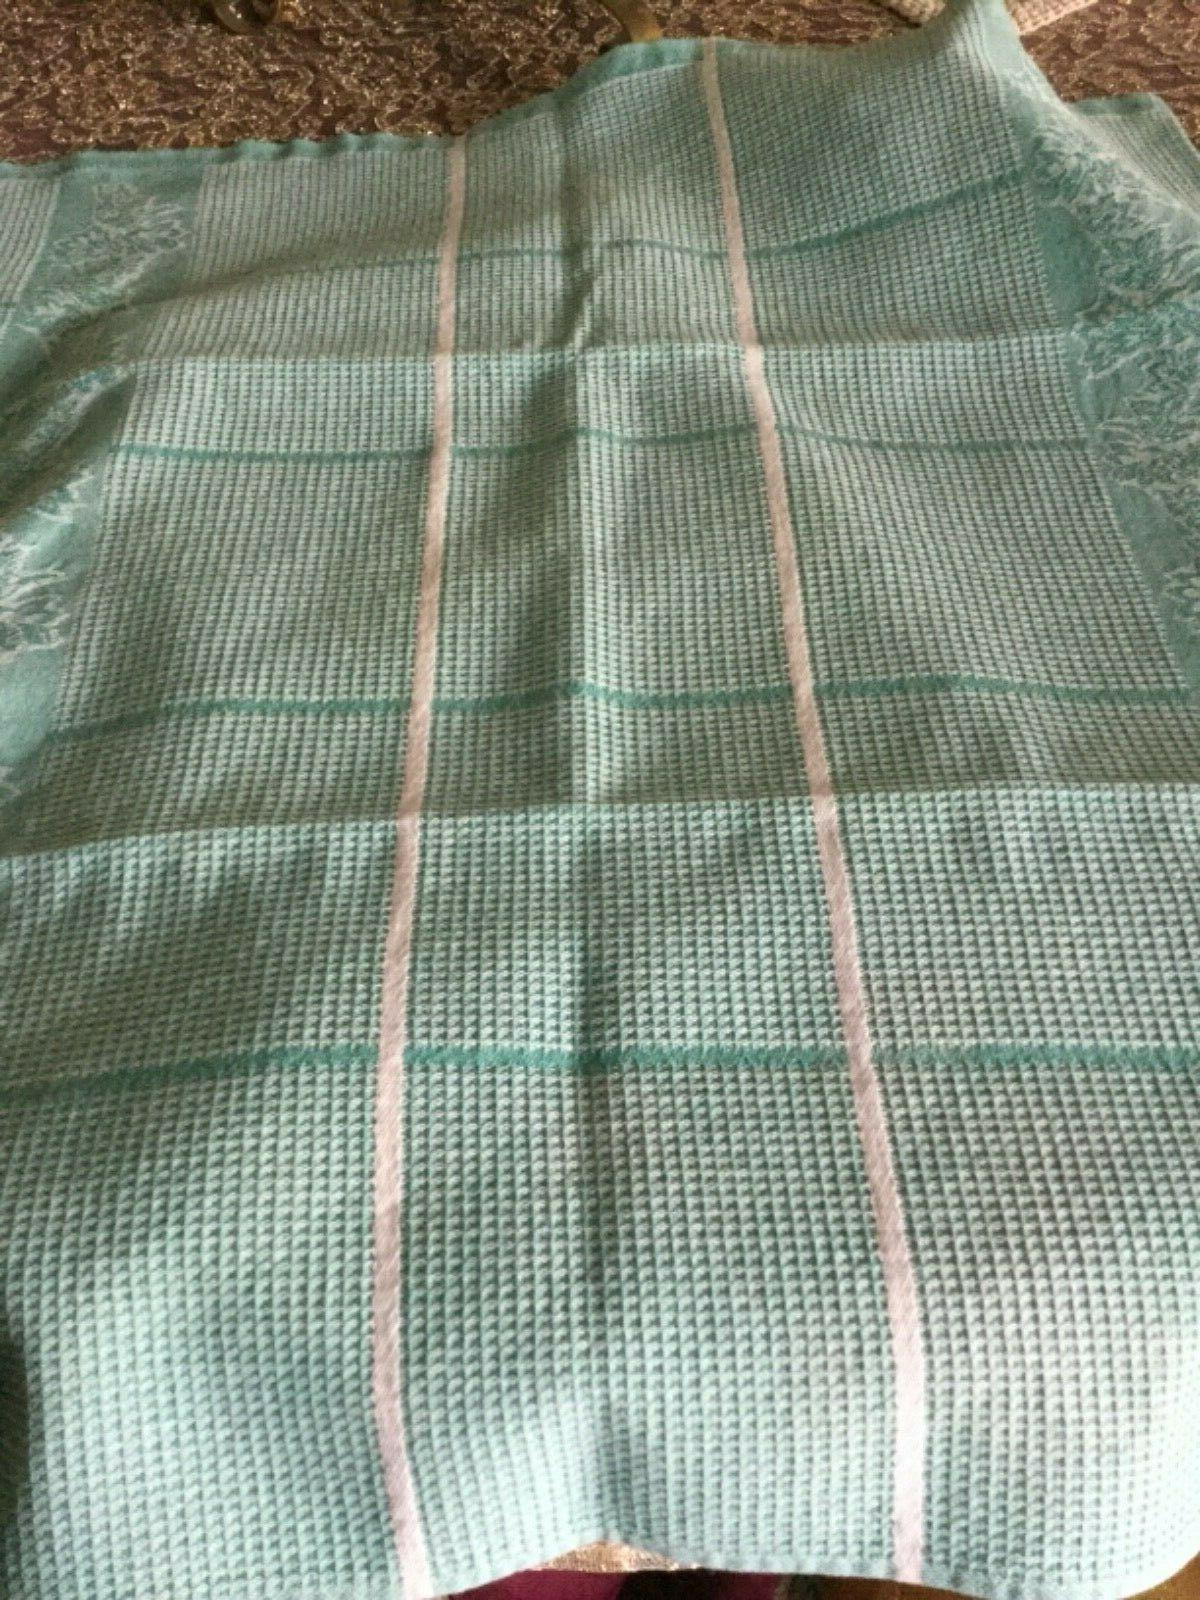 2 & Kitchen Towels w/Leaf Design, 100% Cotton,